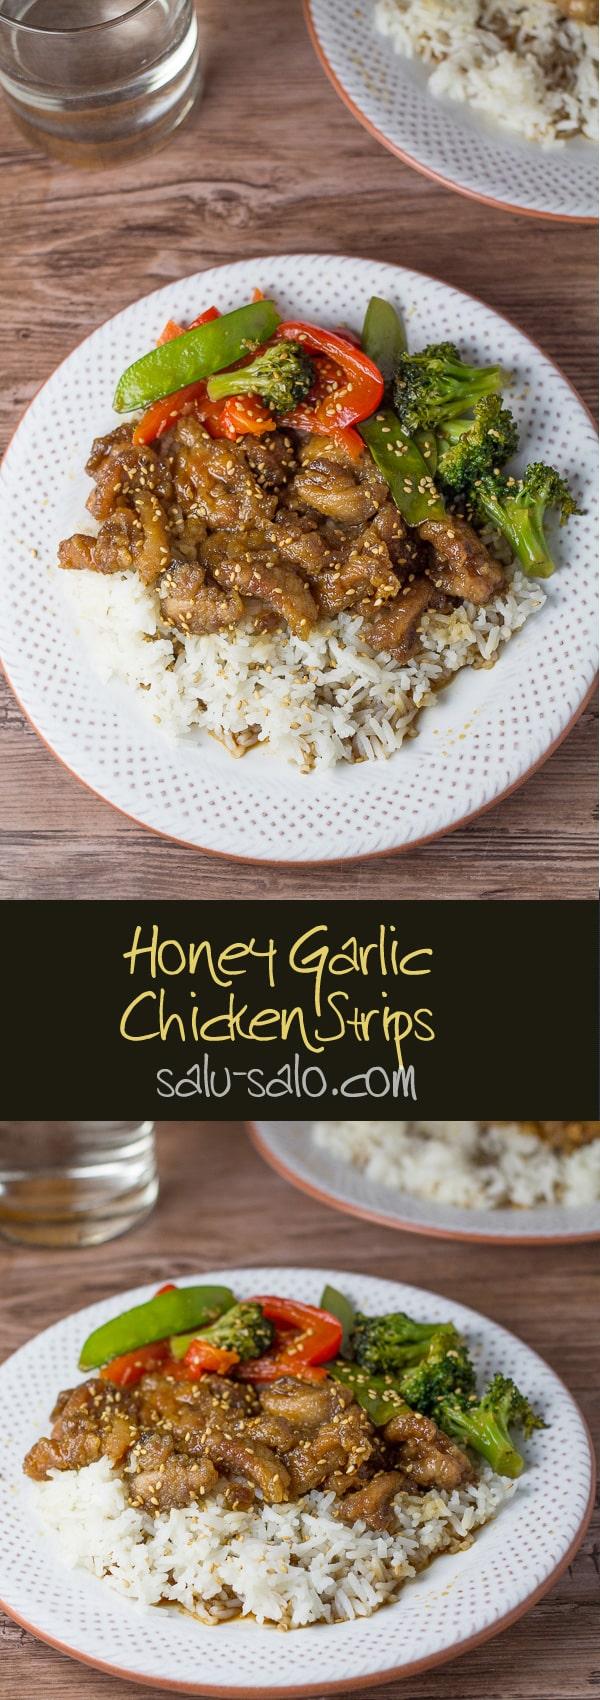 Honey Garlic Chicken Strips